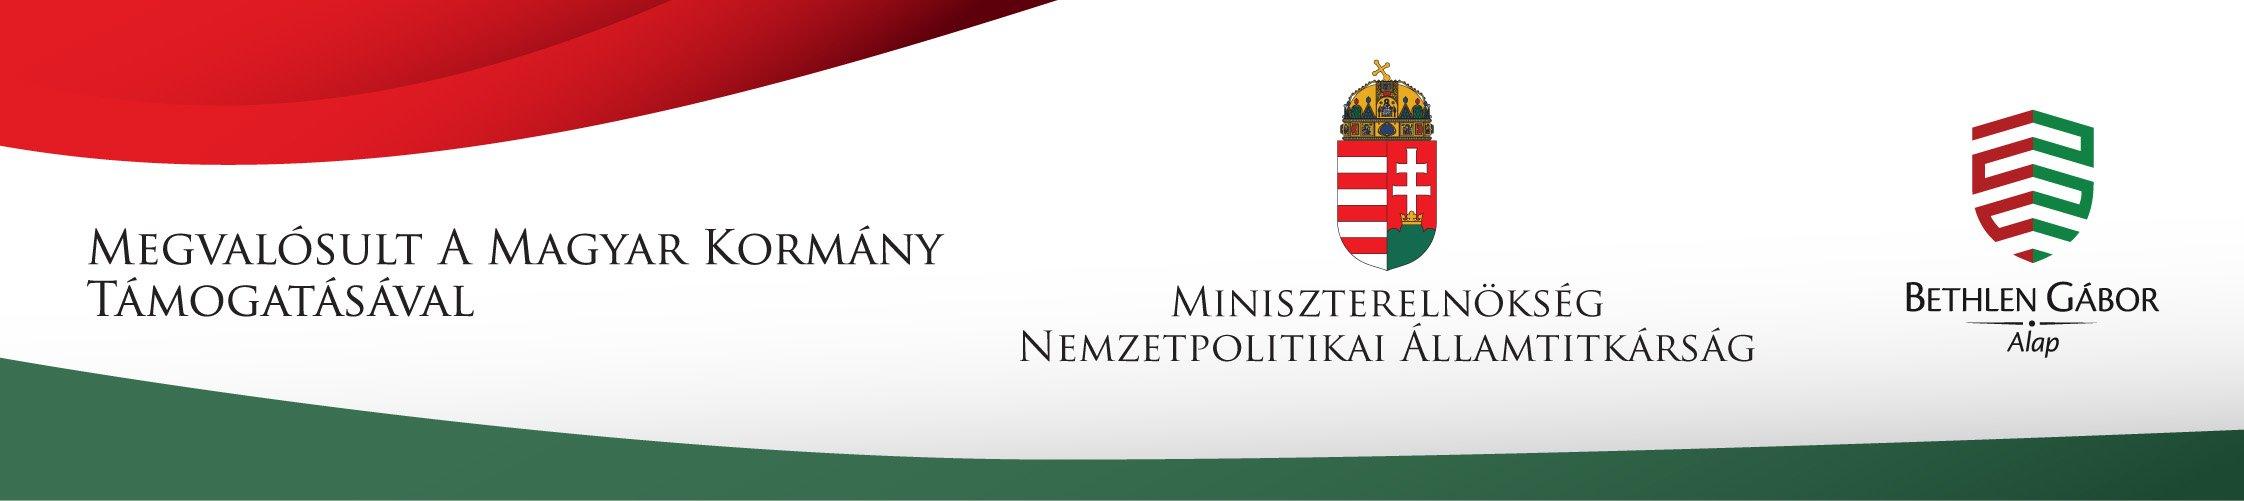 megvalosult_a_magyar_kormany_tamogatasaval_bga_alap-1